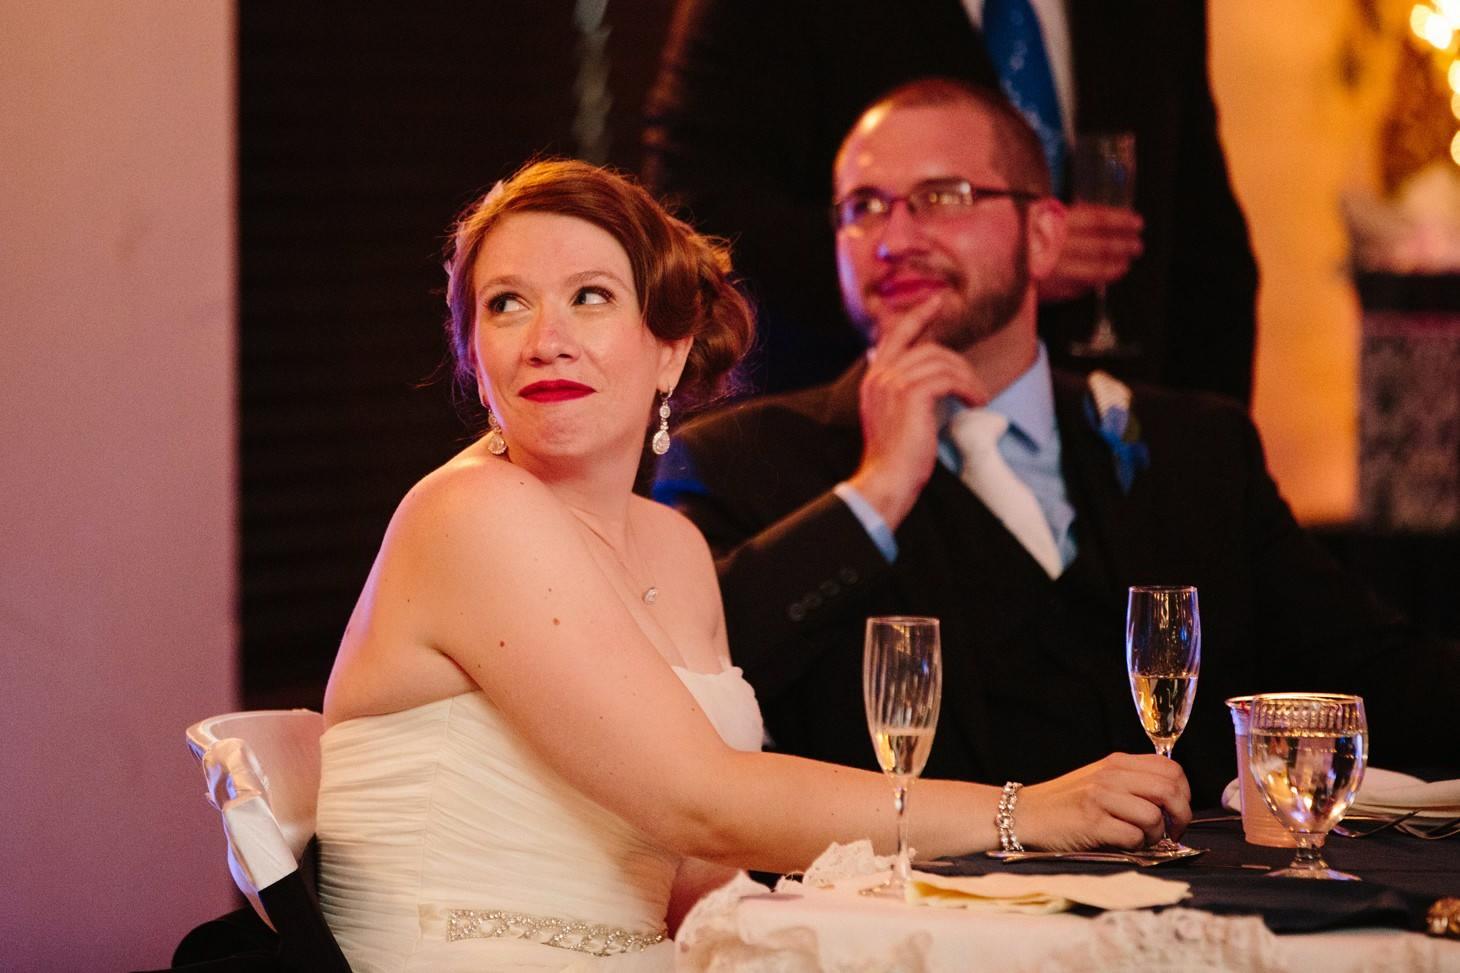 034-nyc-wedding-photographer-nj-nerdy-dr-who-firehouse-wedding-smitten-chickens.jpg